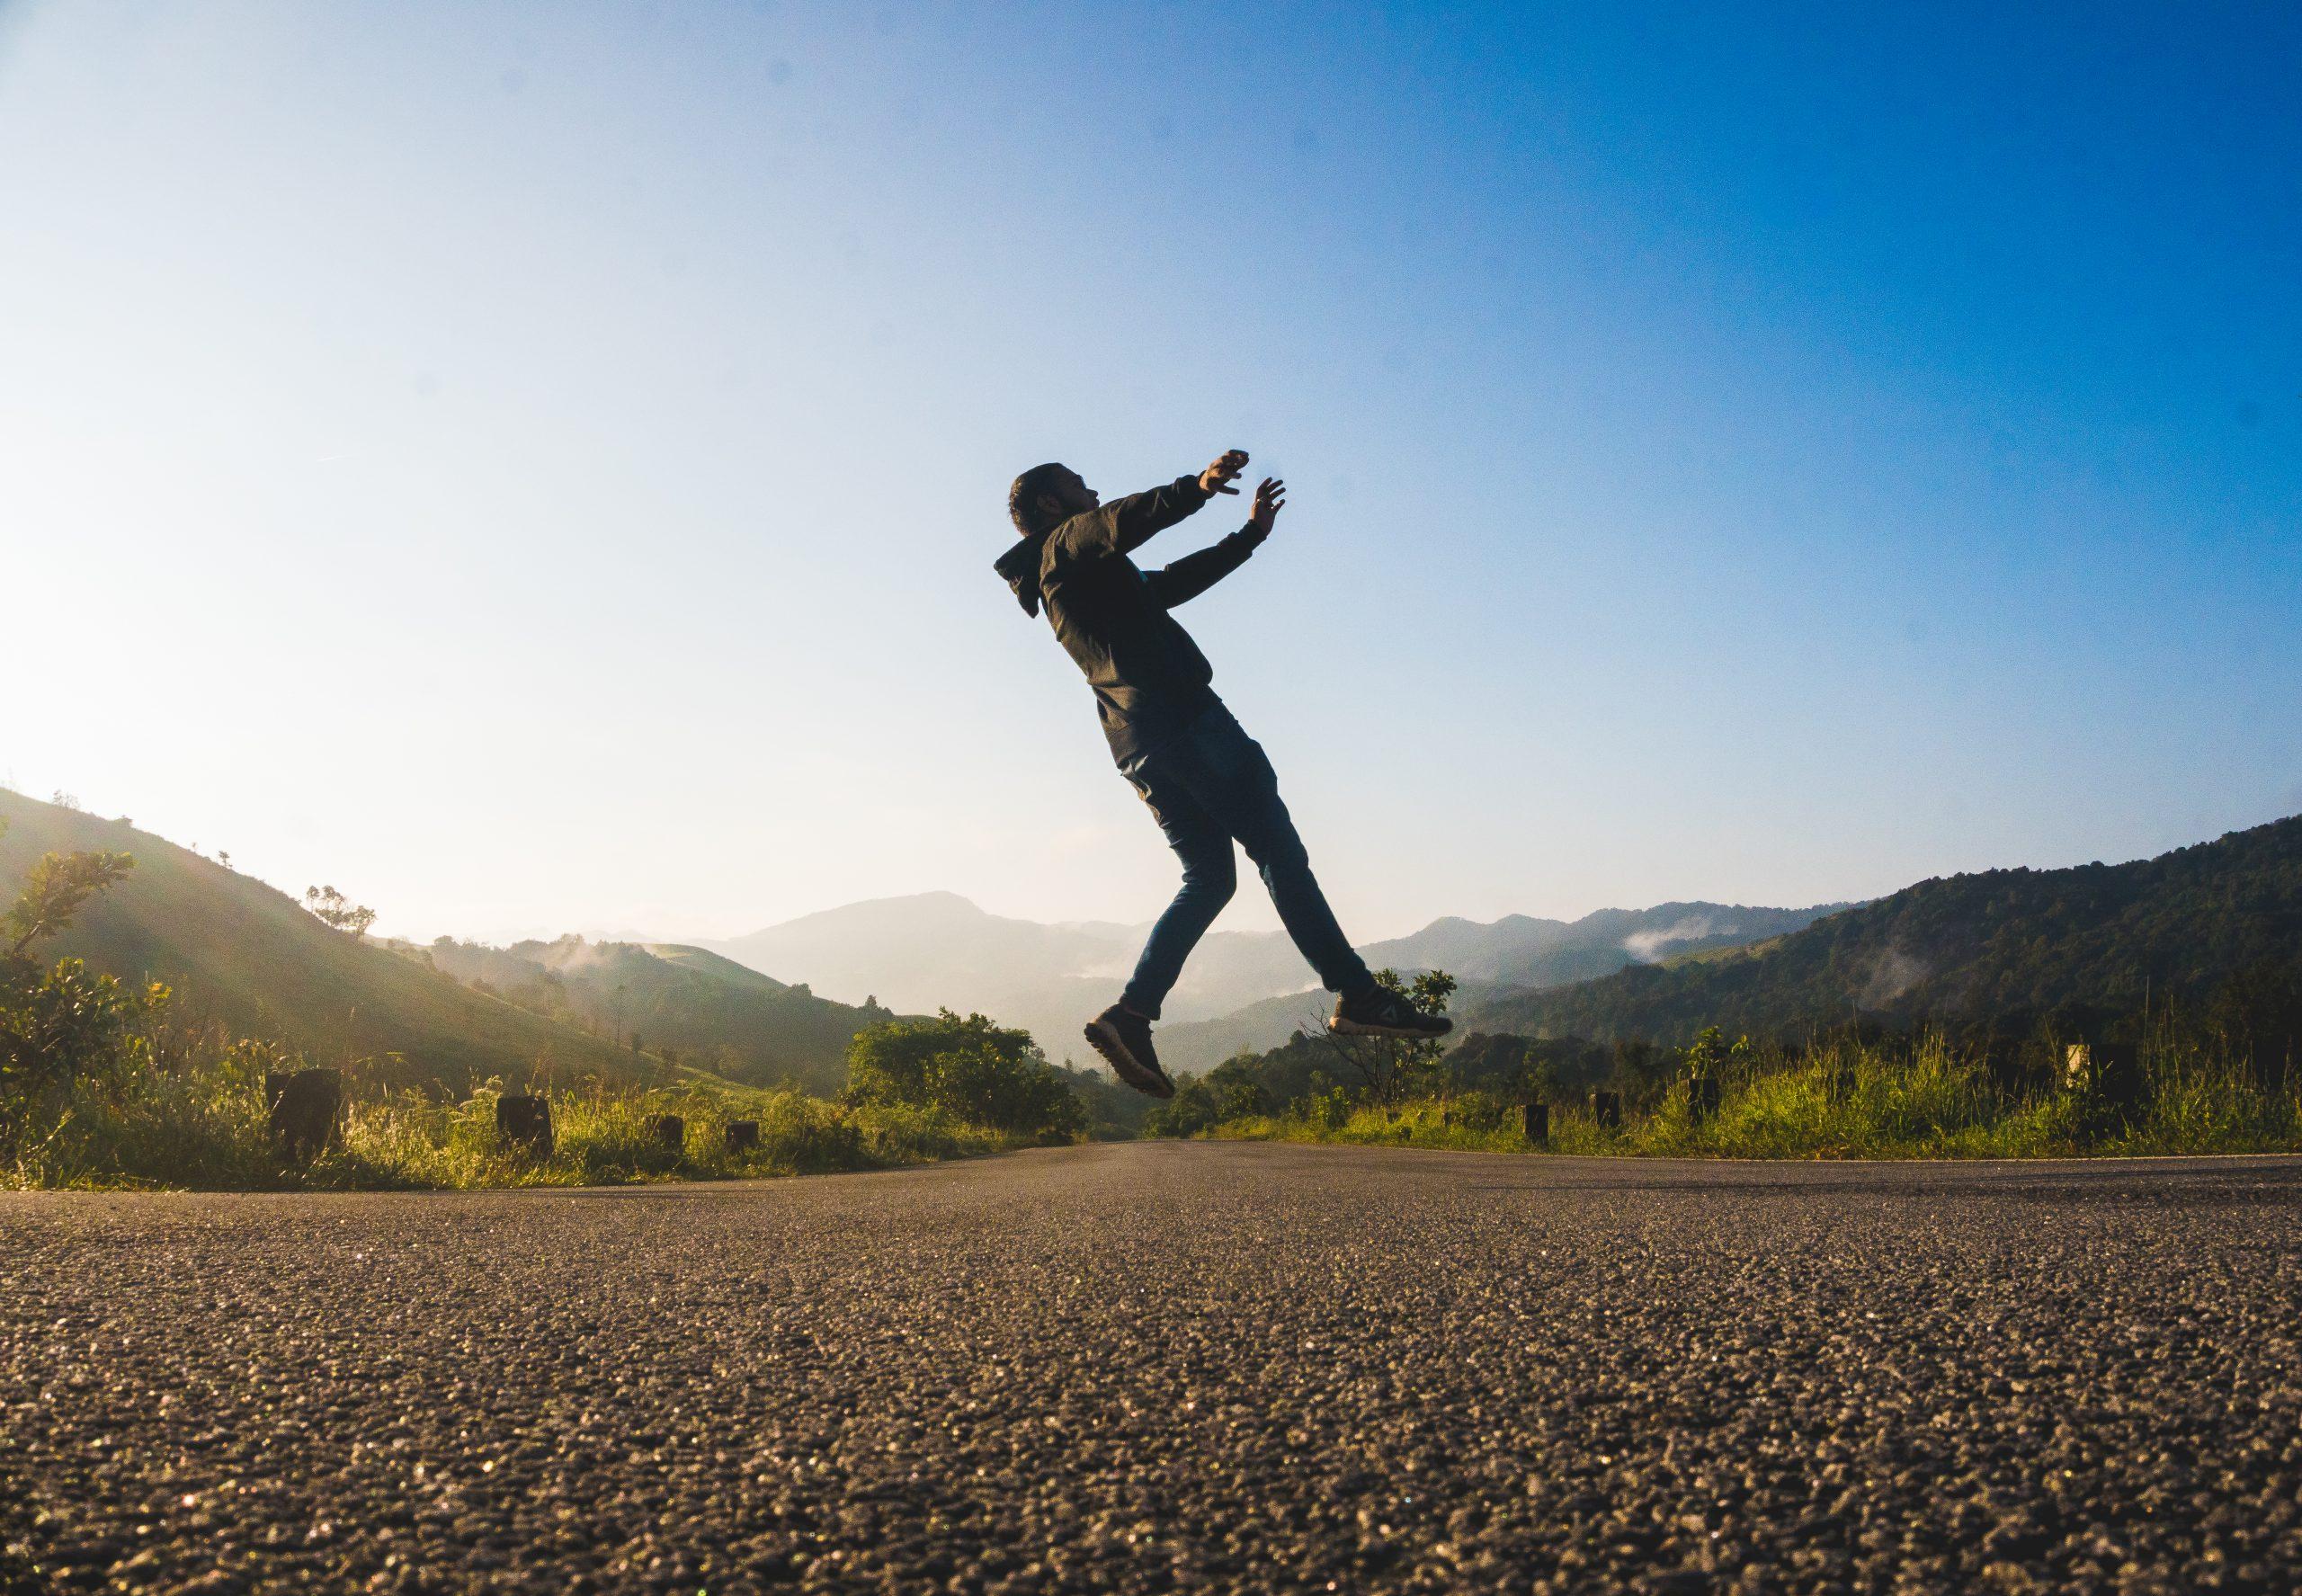 A boy jumping in joy